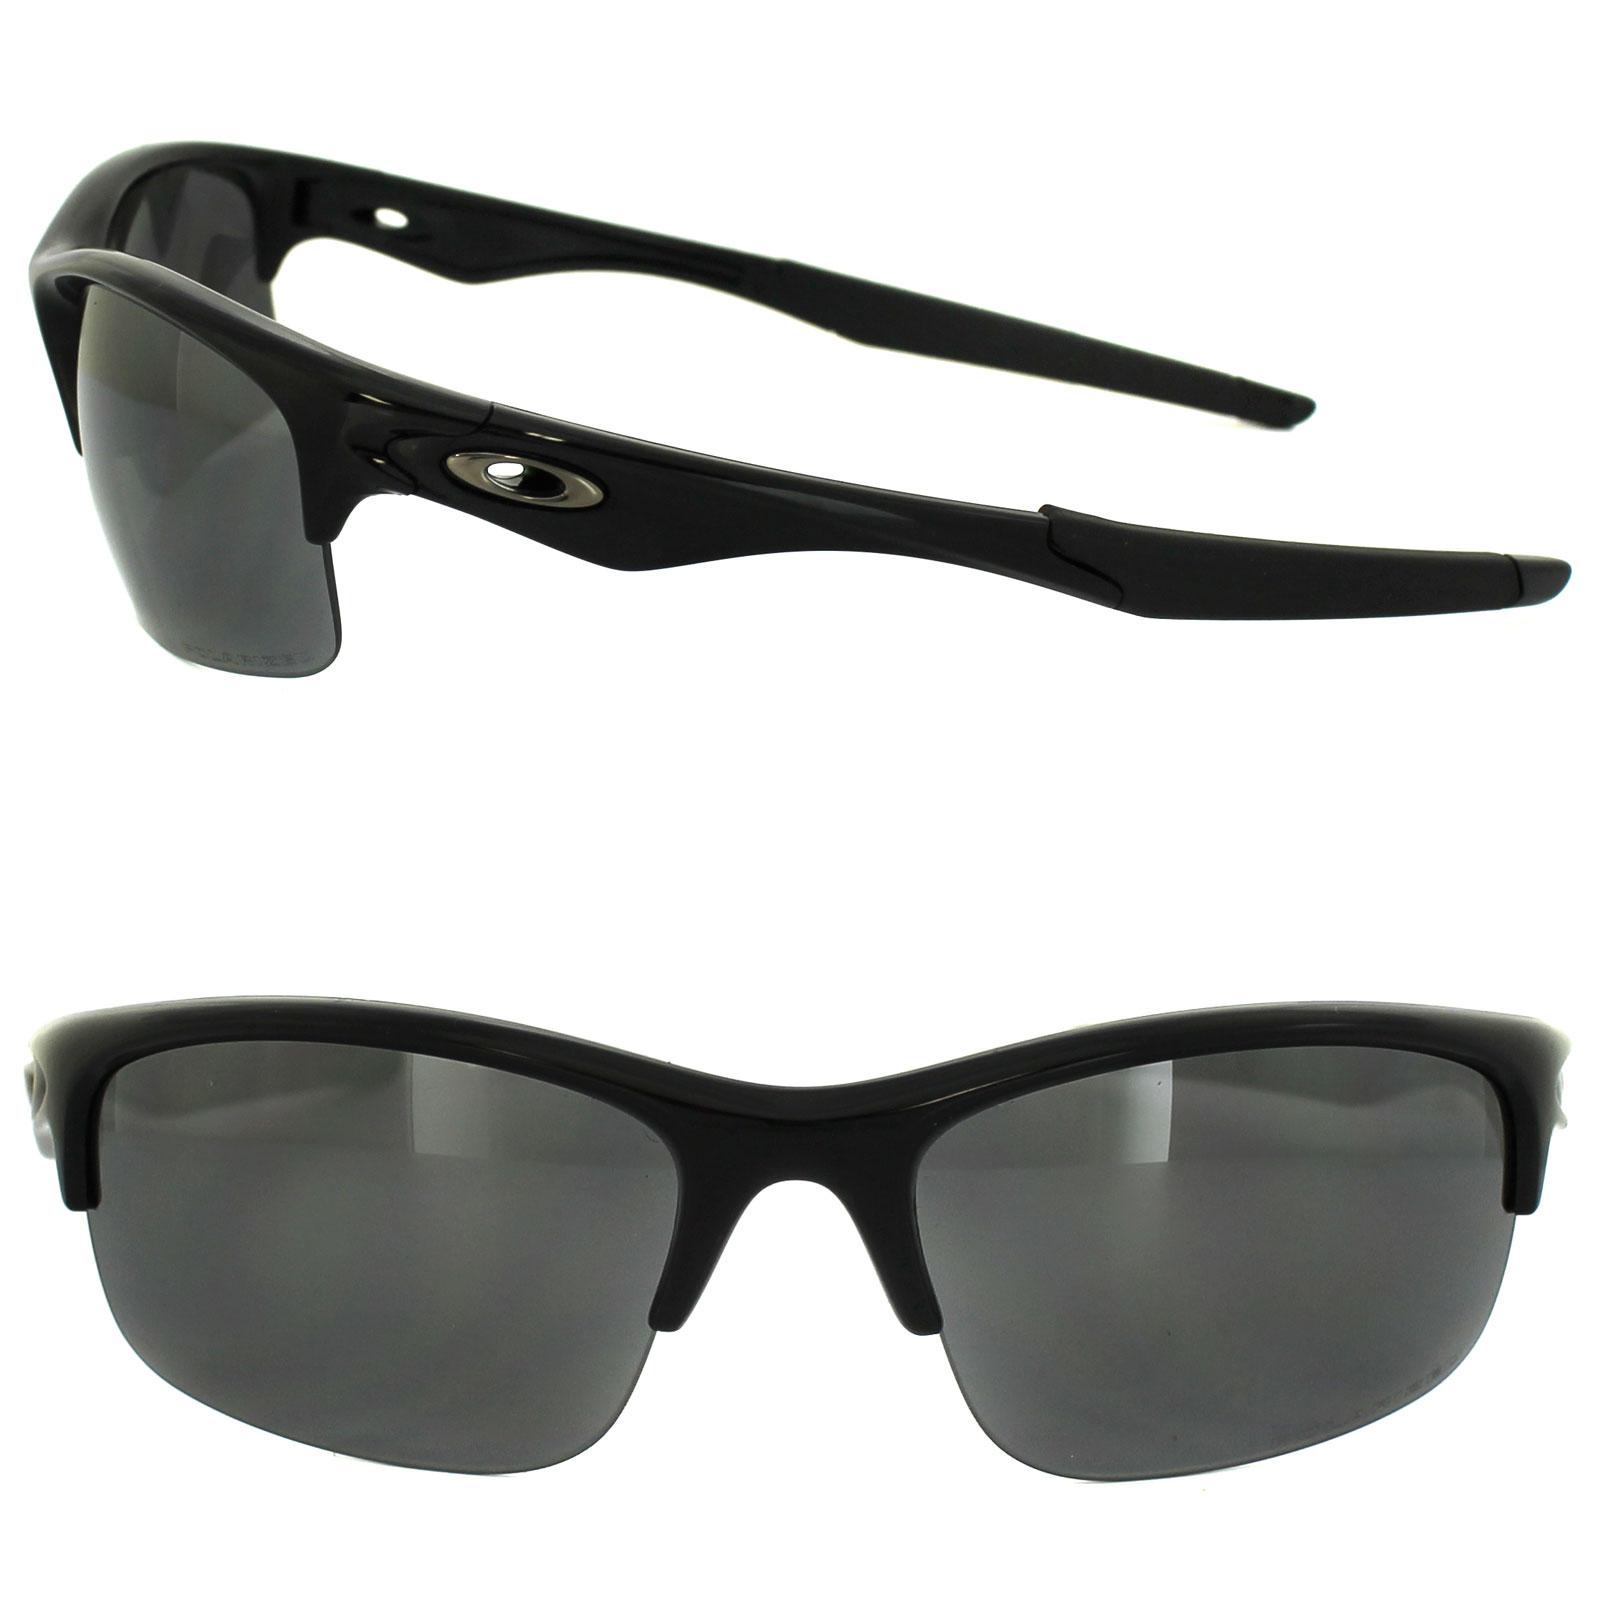 3f217284363 Oakley Bottle Rocket Sunglasses Black Iridium « Heritage Malta